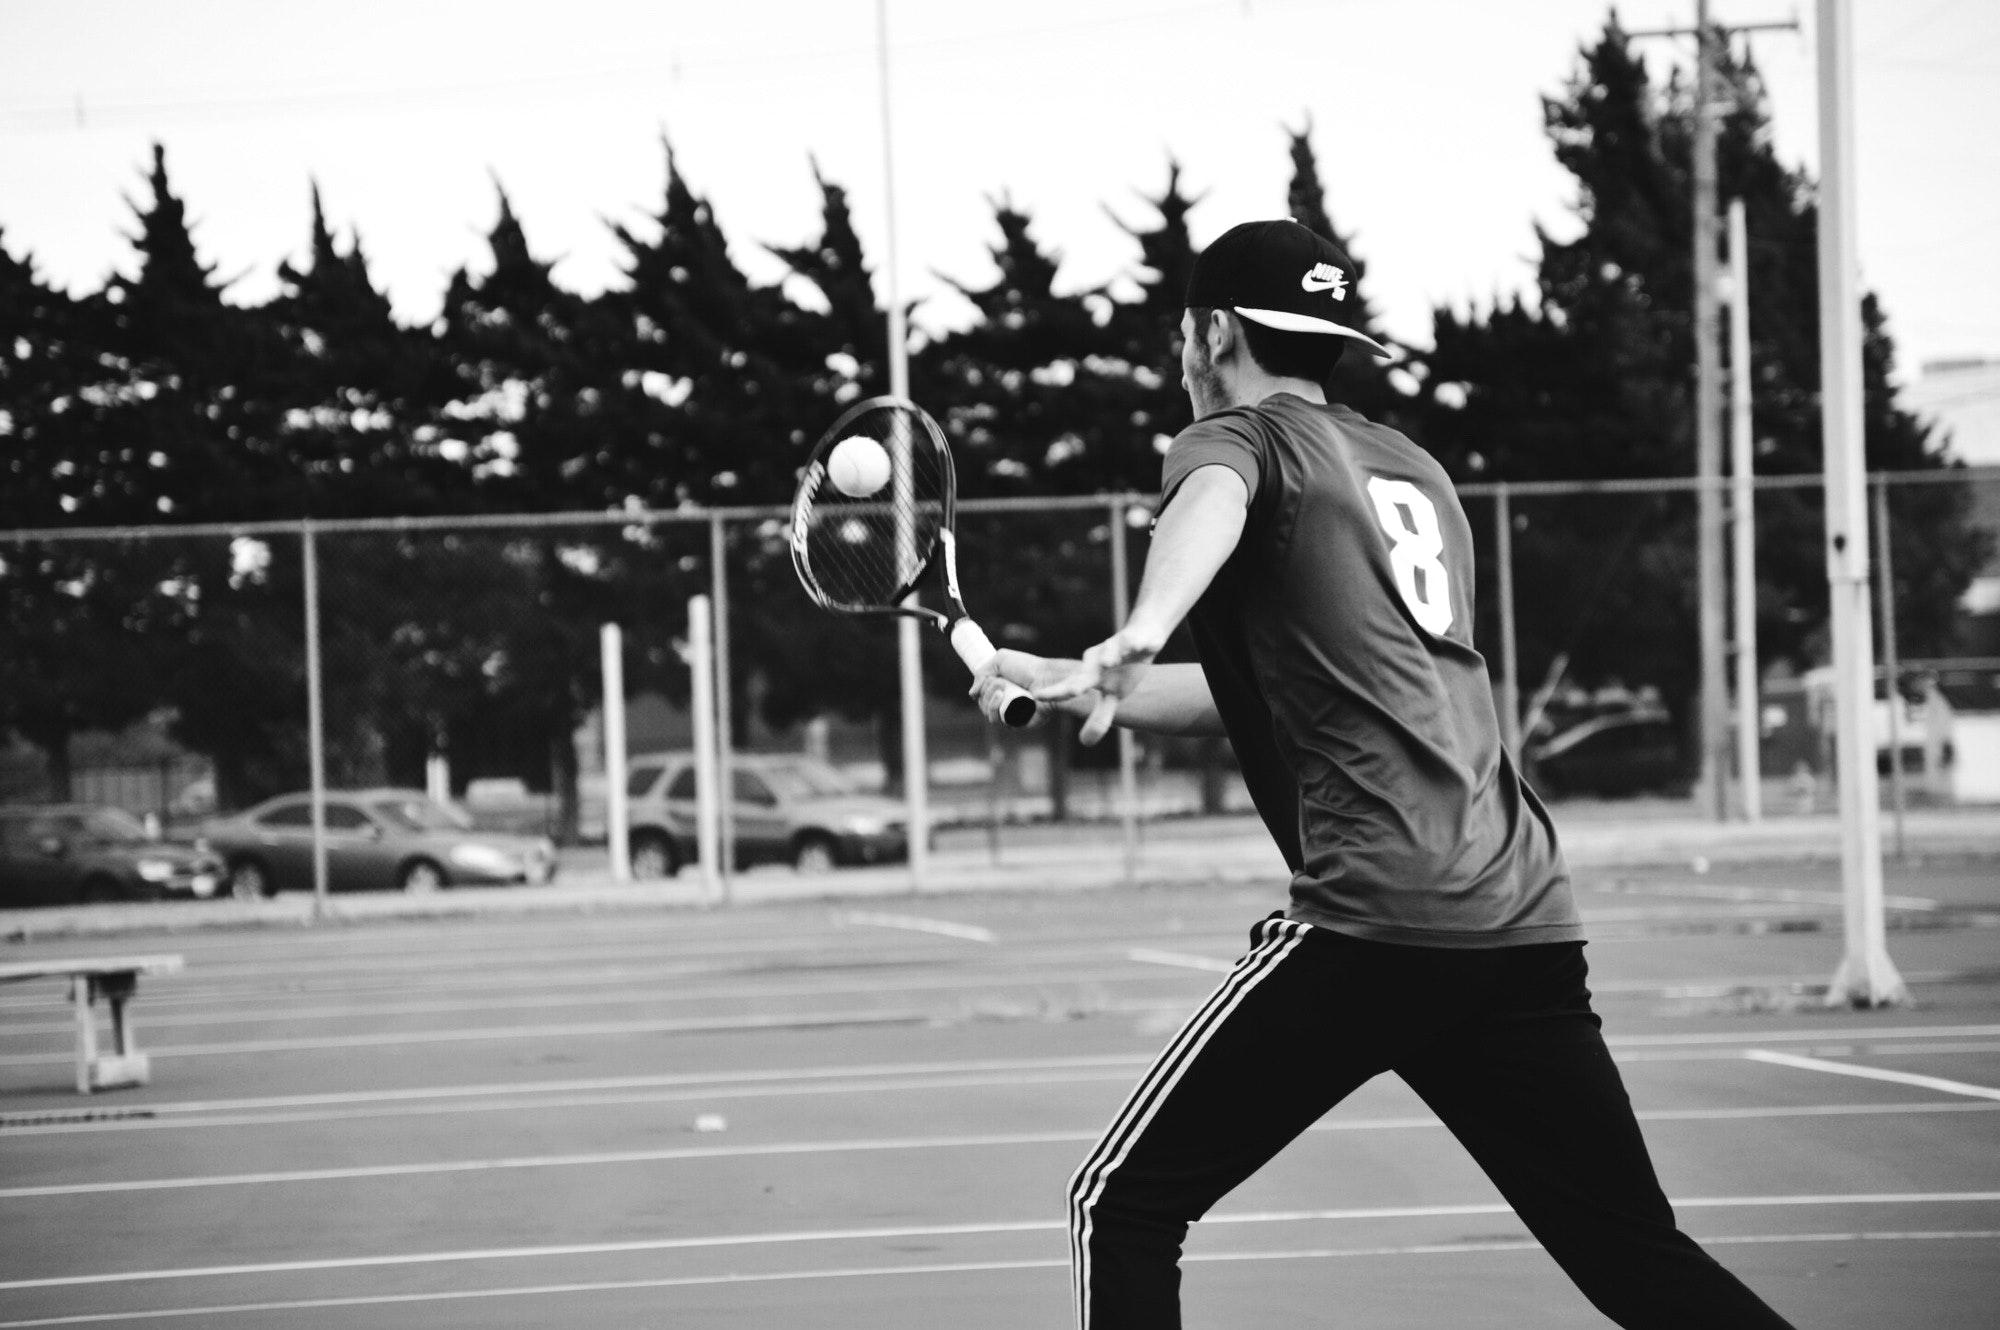 Tucker C. teaches tennis lessons in Tulsa, OK